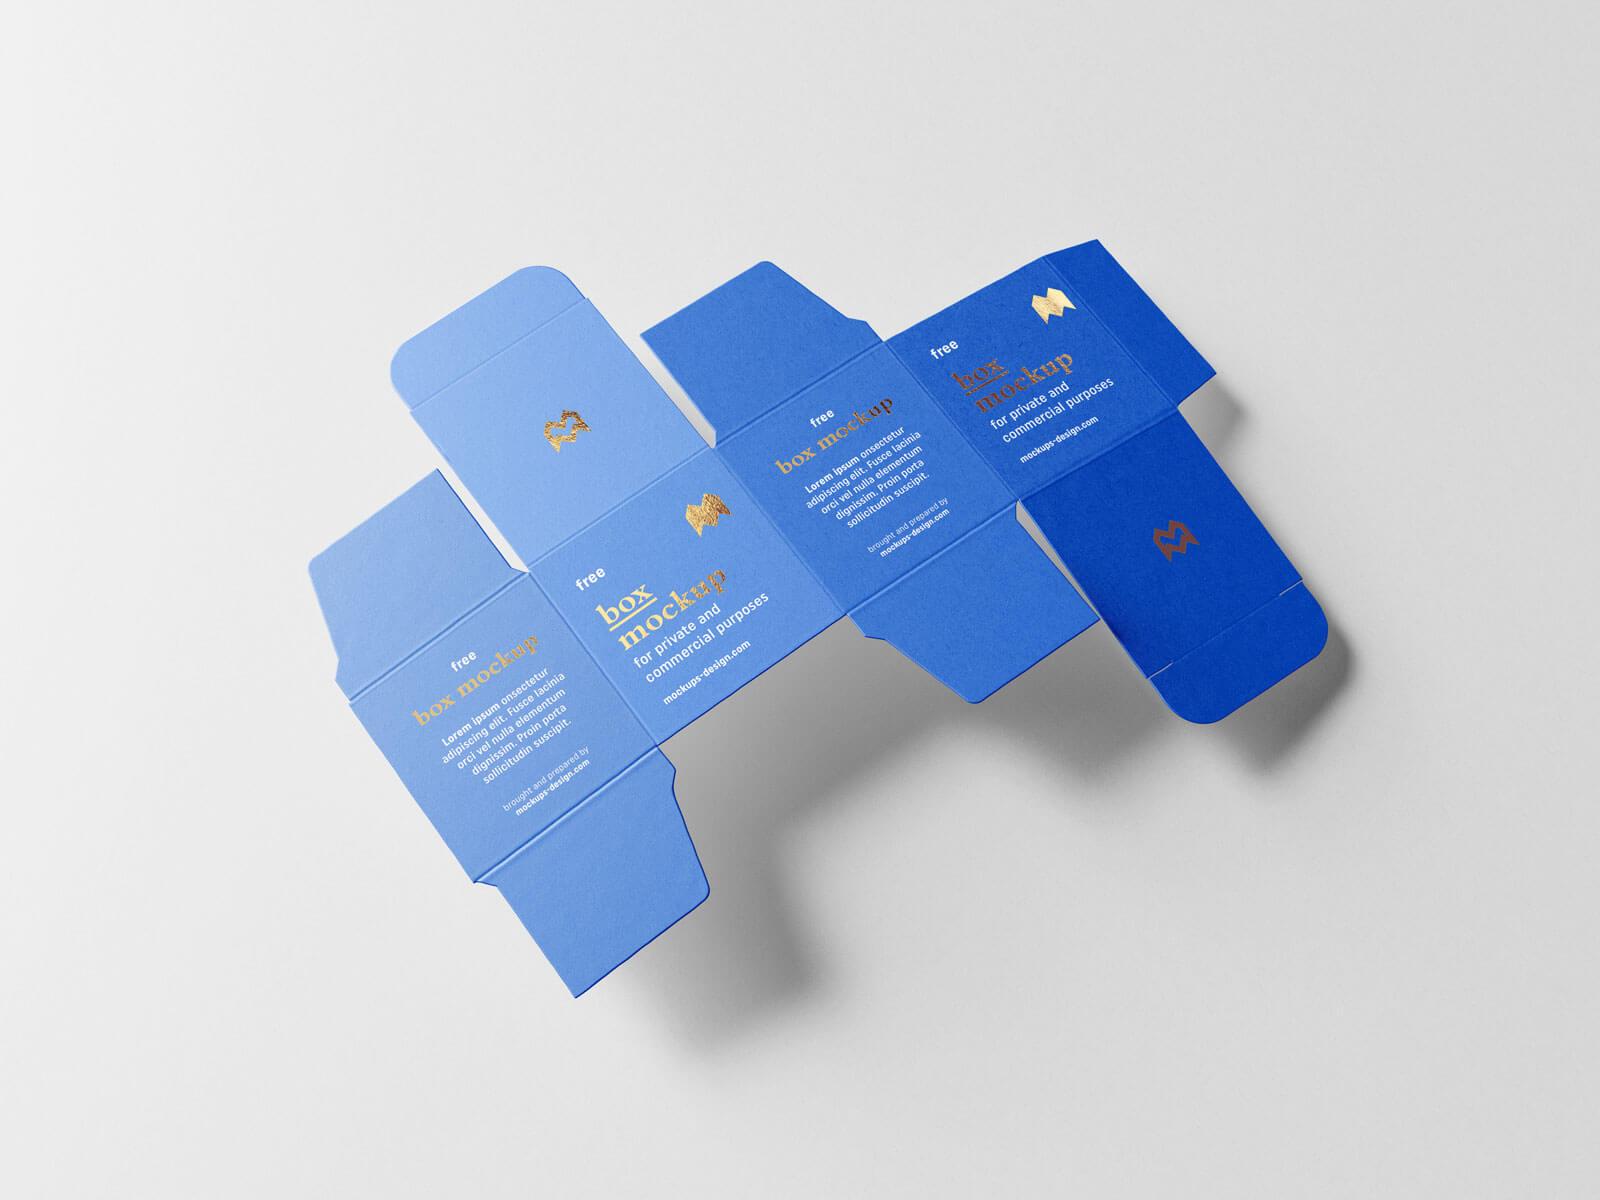 Free Unfolded Box Medicine Packaging Mockup PSD Set (3)